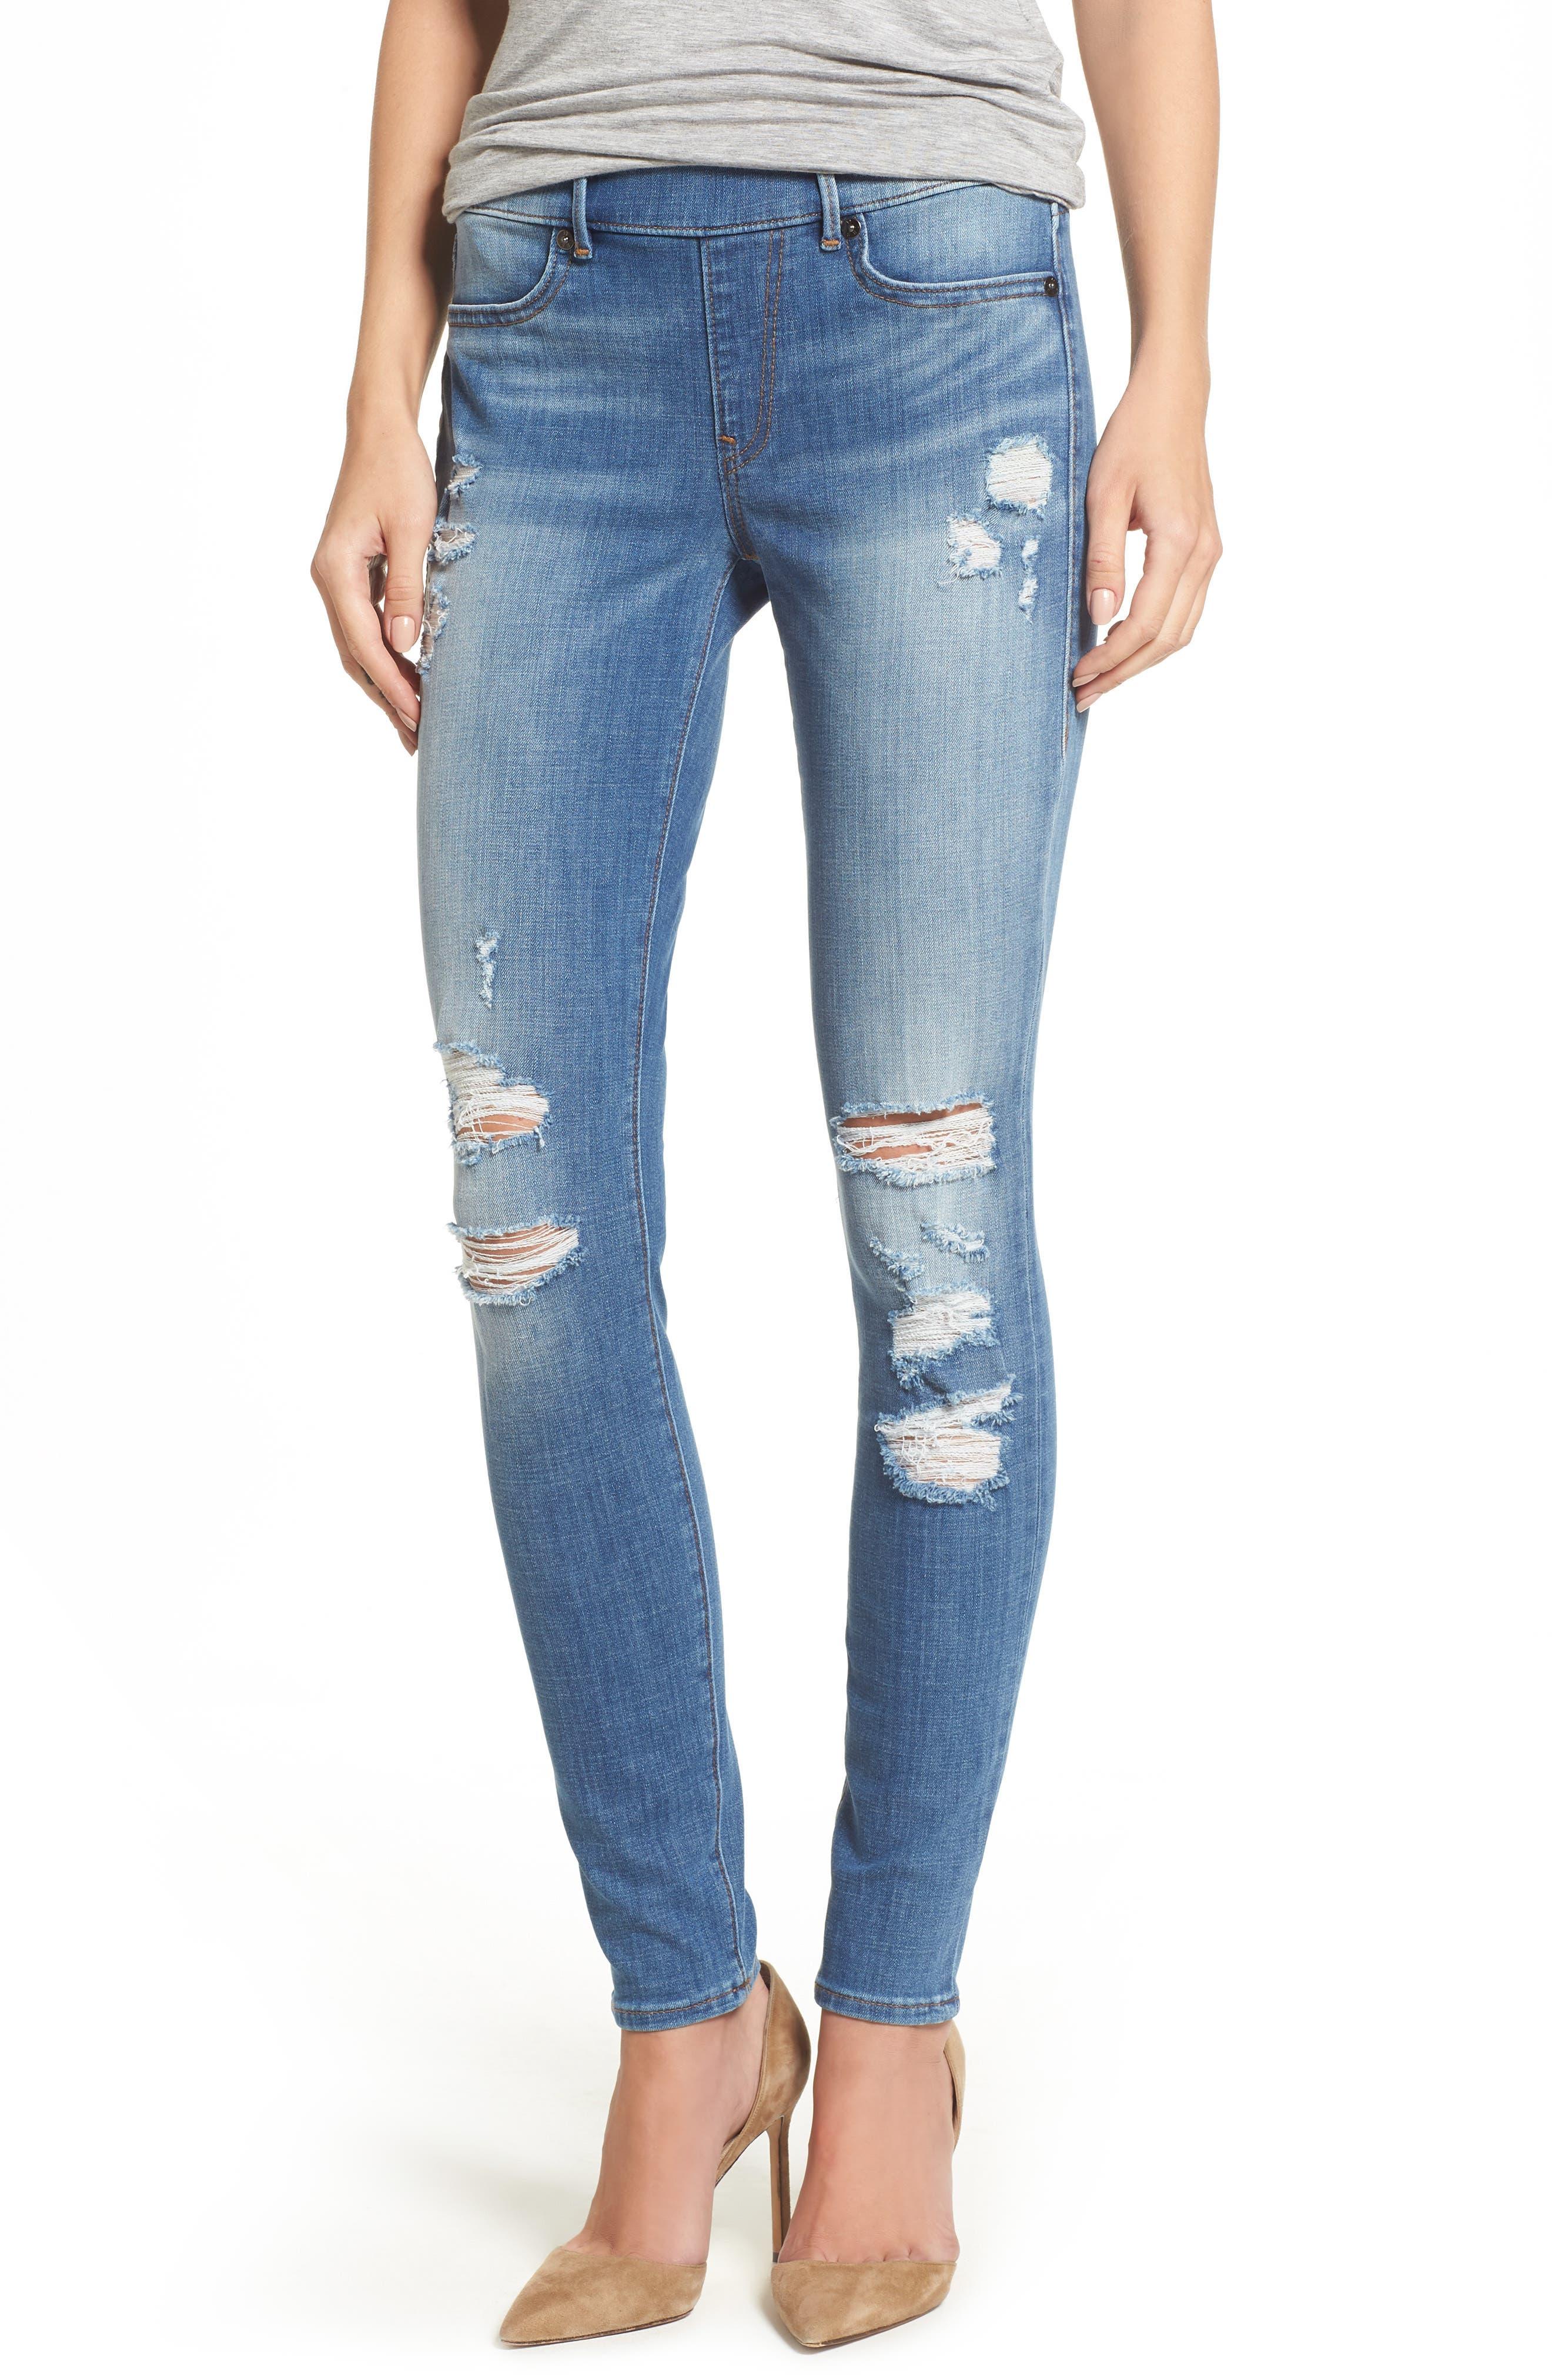 Jennie Runway Curvy Skinny Jeans,                             Main thumbnail 1, color,                             400